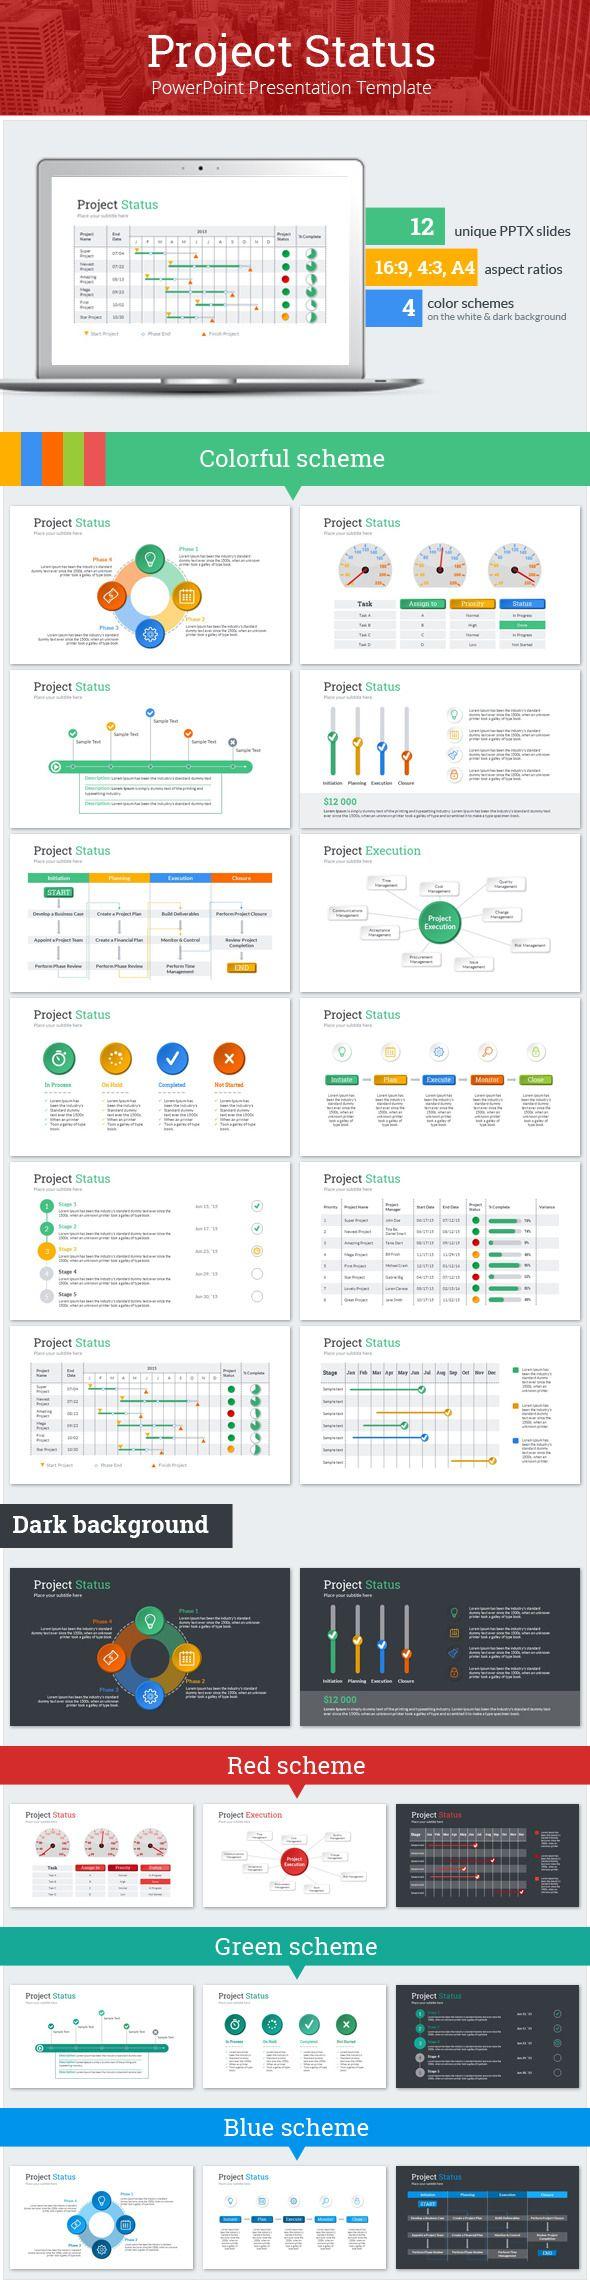 Project status powerpoint presentation template powerpoint project status powerpoint presentation template toneelgroepblik Image collections